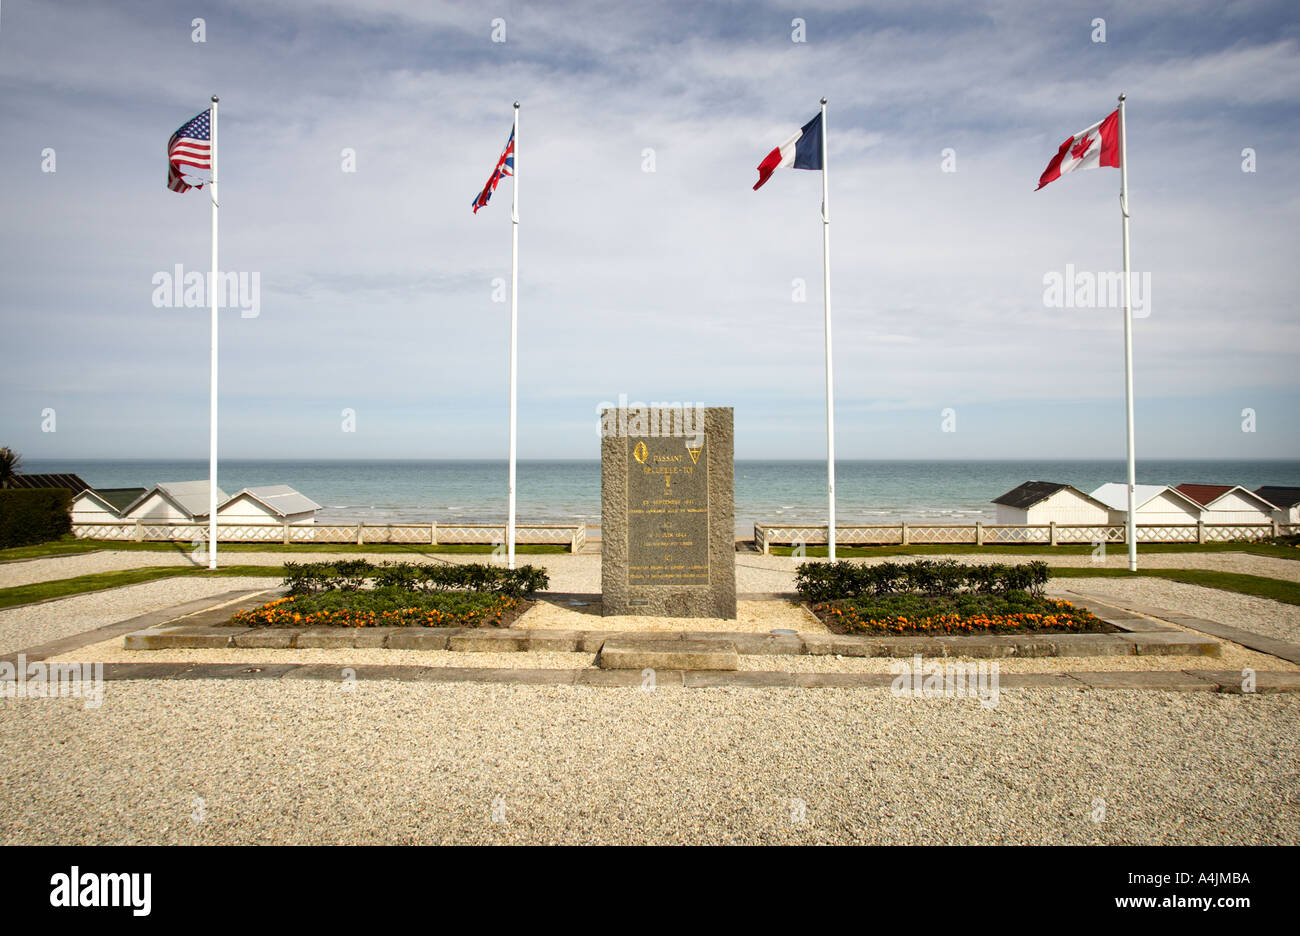 World War 2 memorial à libération D Jour Sword Beach, Luc Sur Mer, Normandie, France Photo Stock